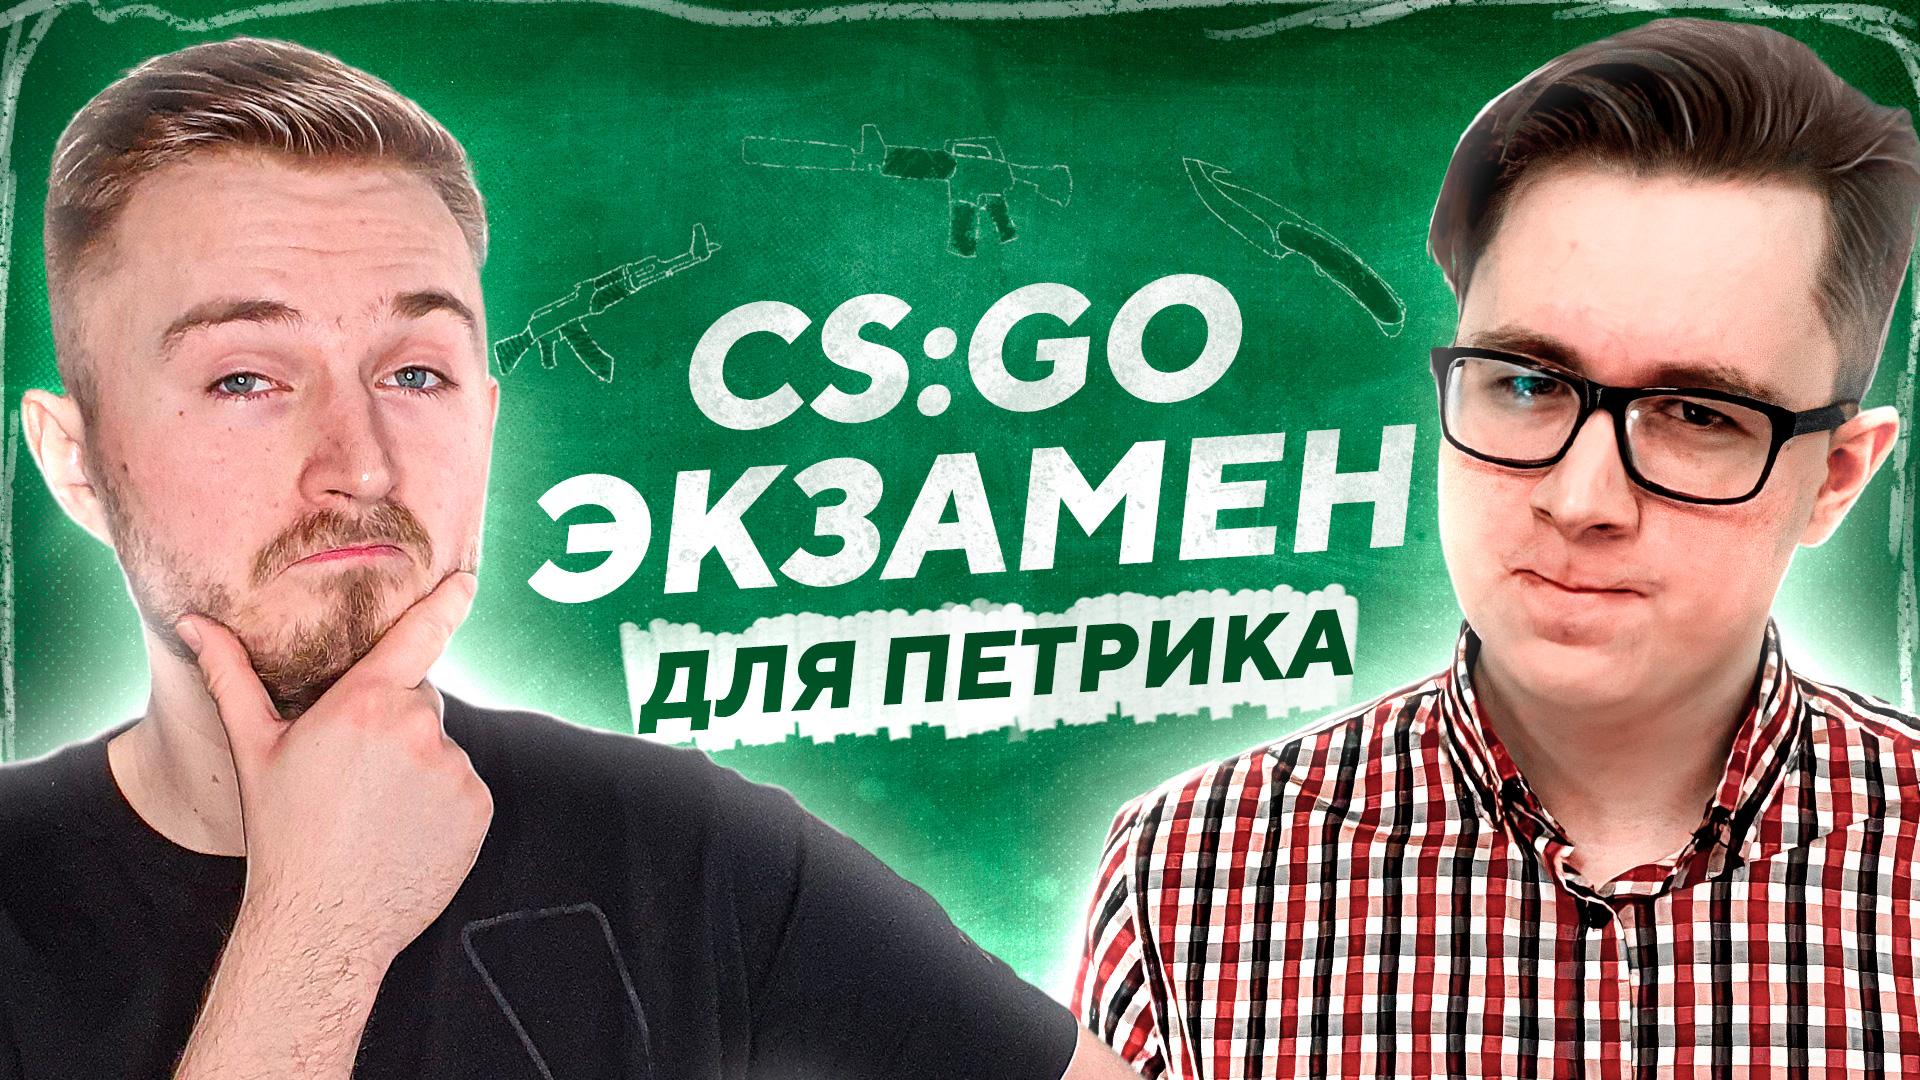 Александр «Petr1k» Петрик